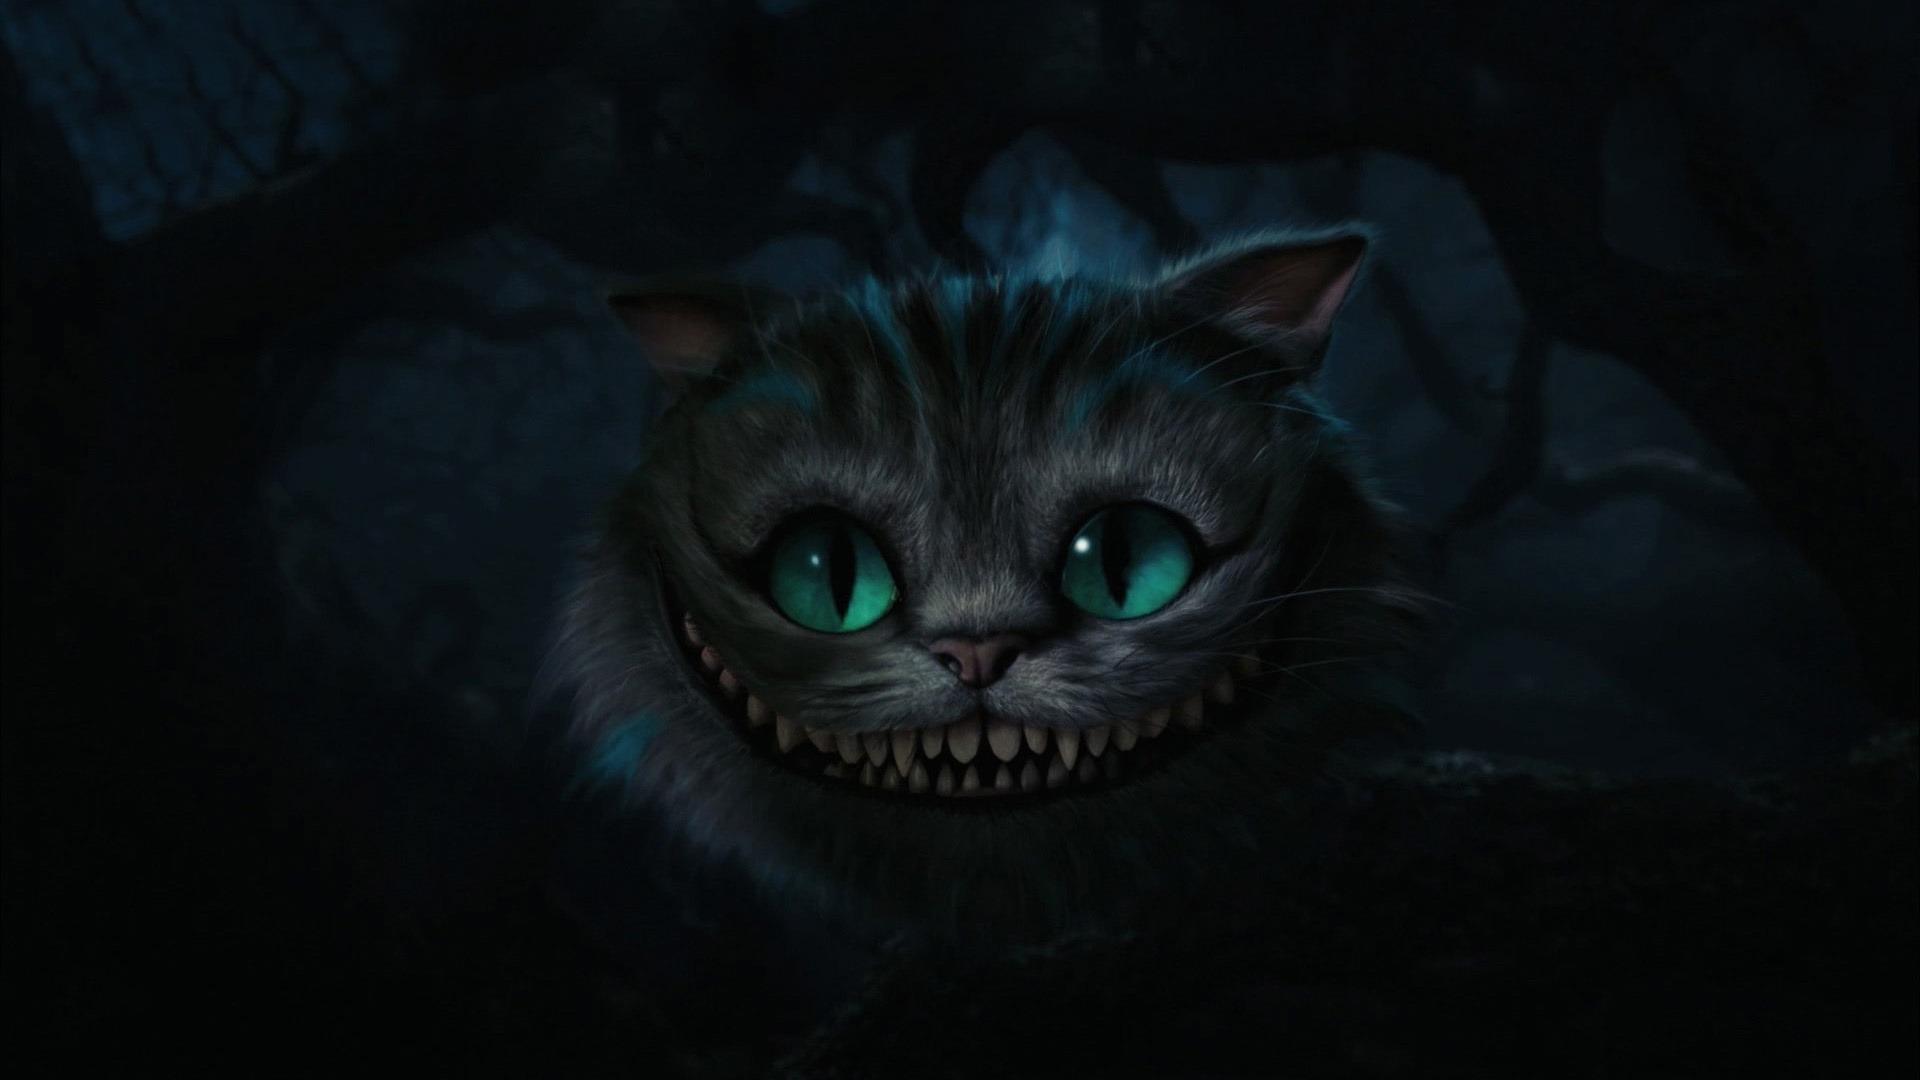 alice in wonderland cat wallpaper Photo